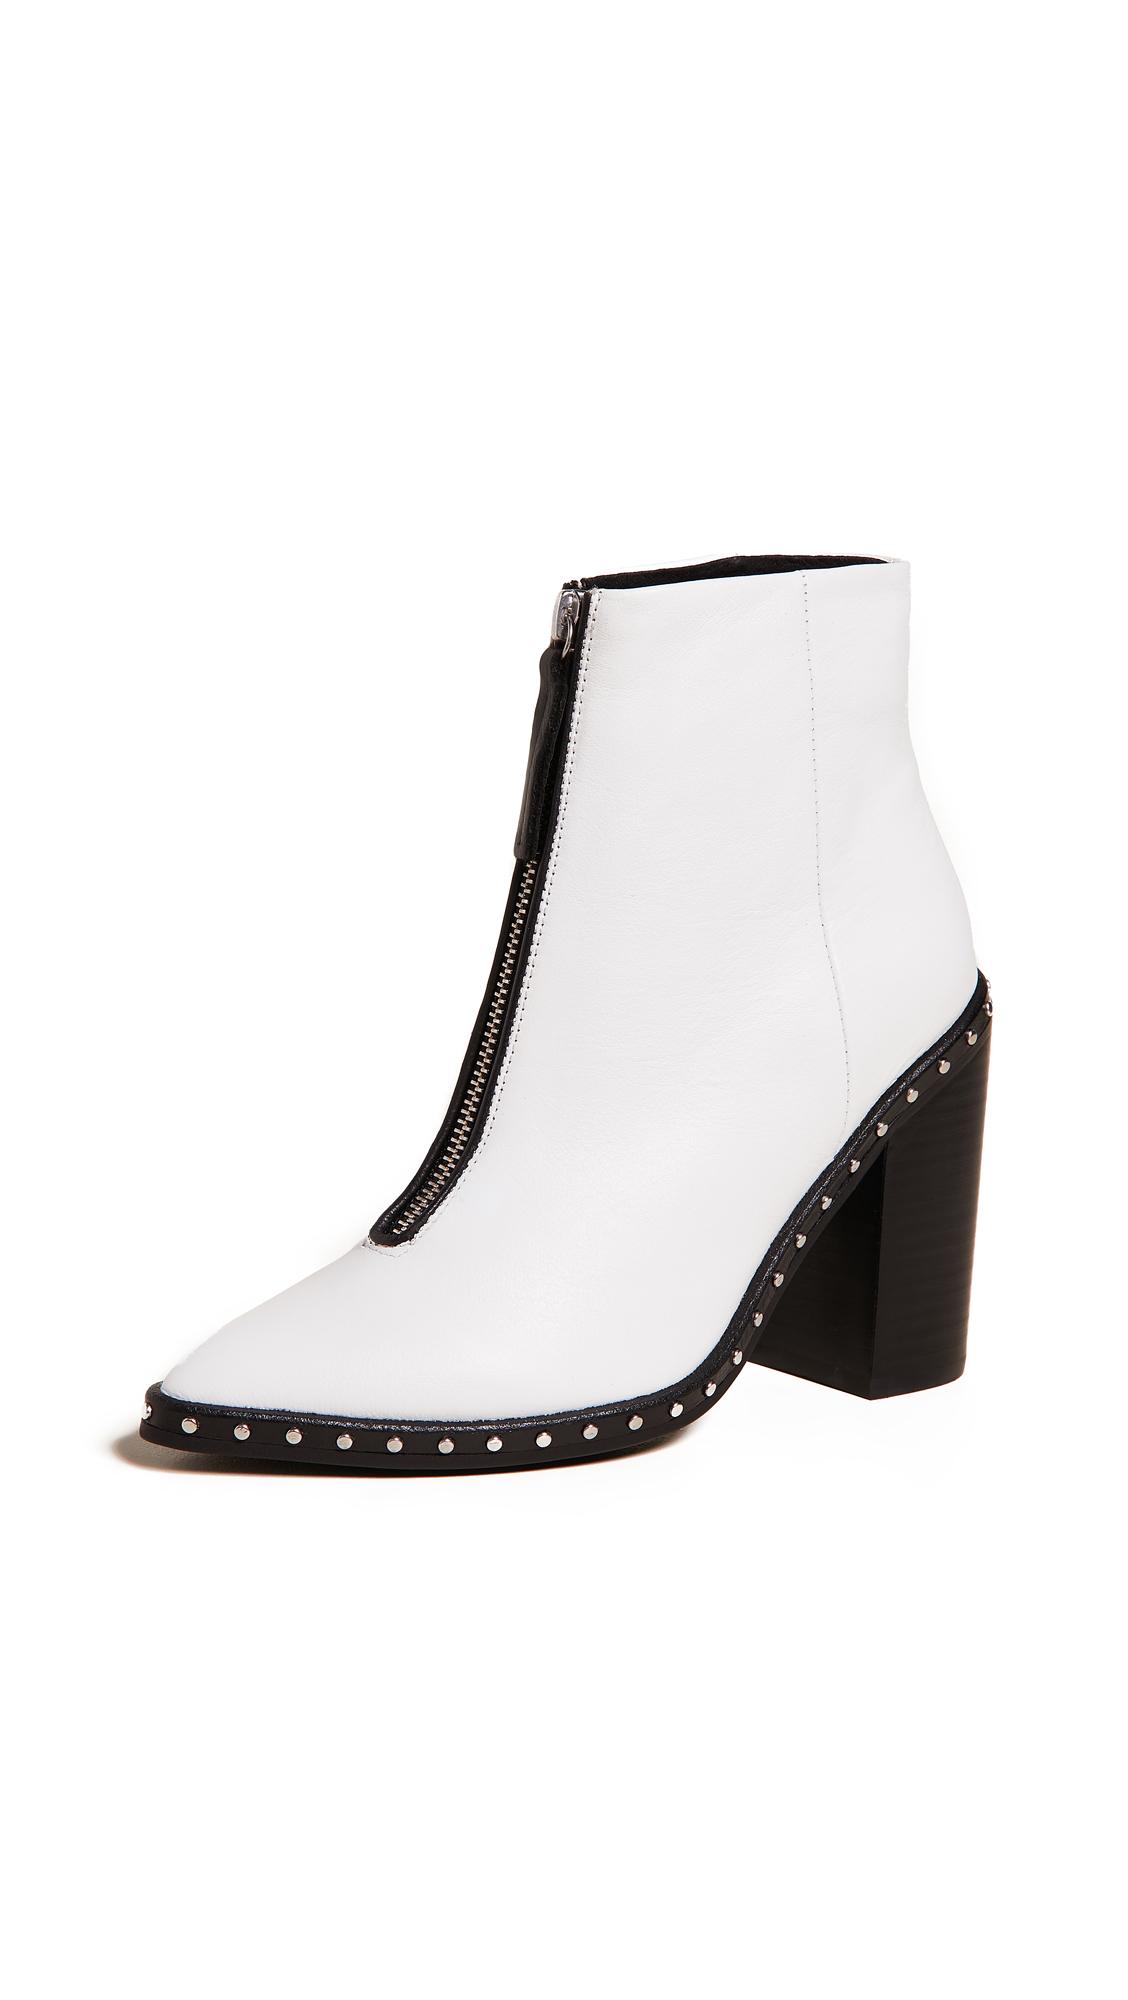 Sol Sana Axel Block Heel Boots - White